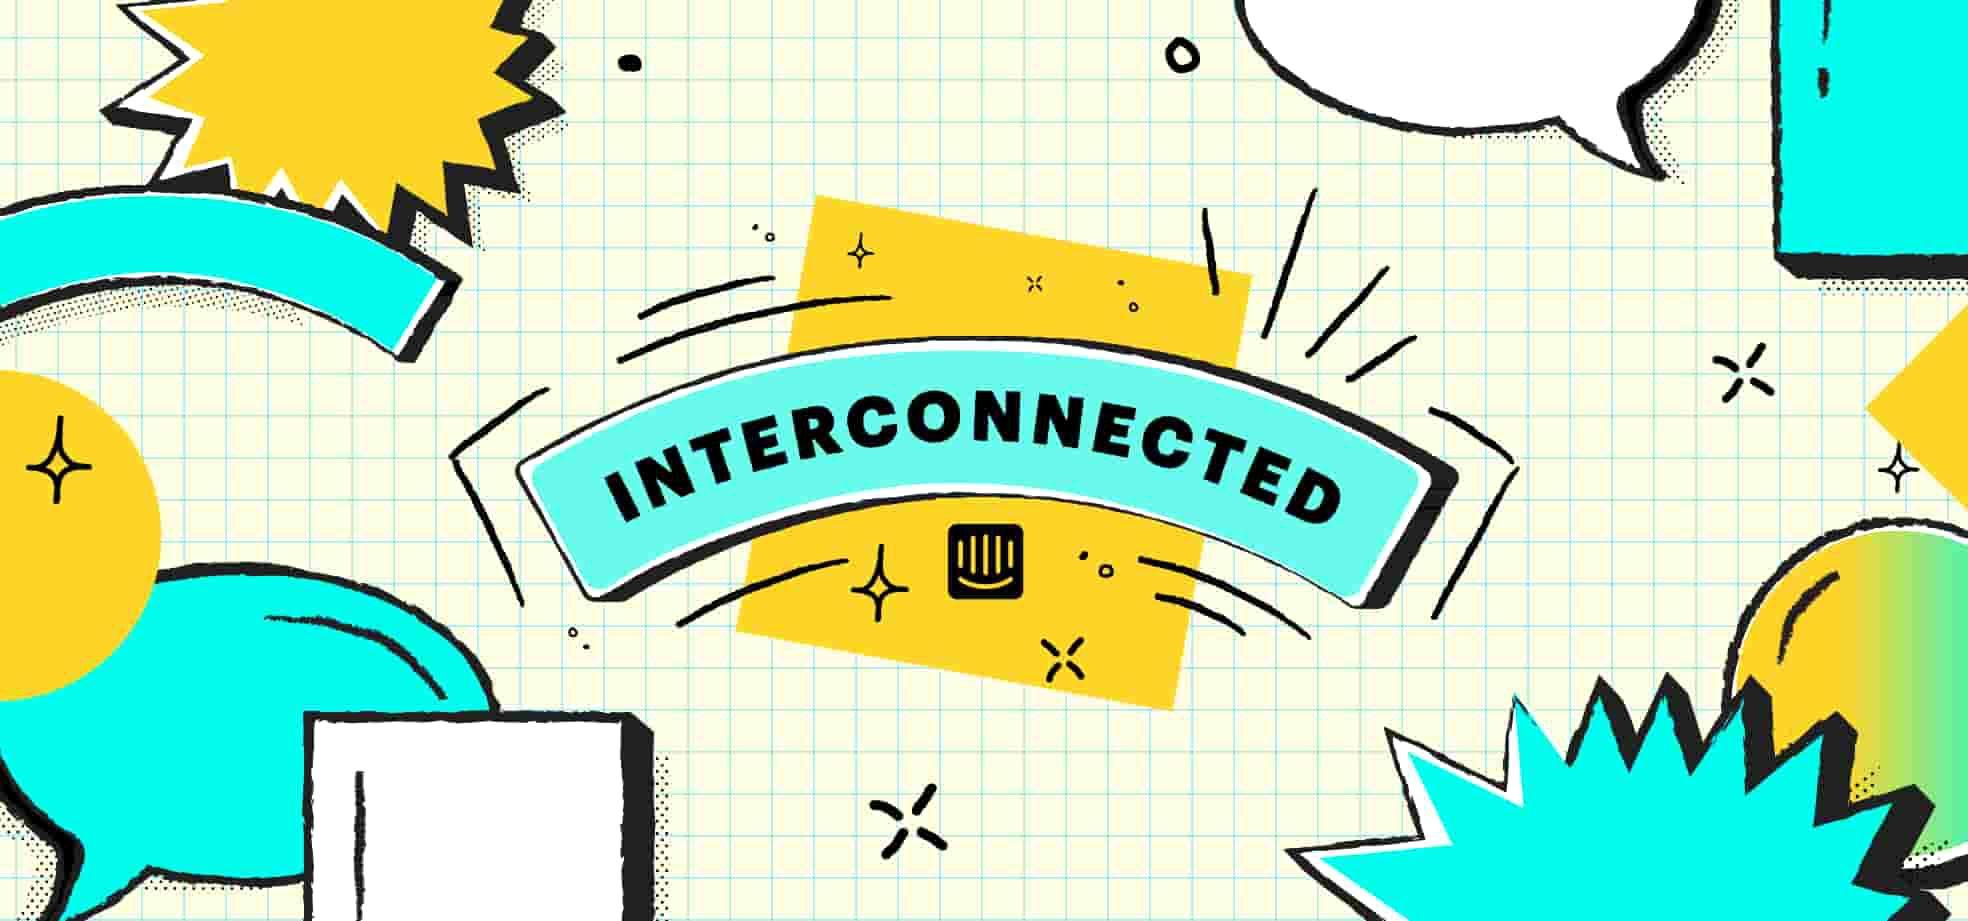 Meet Interconnected – Intercom's customer community forum